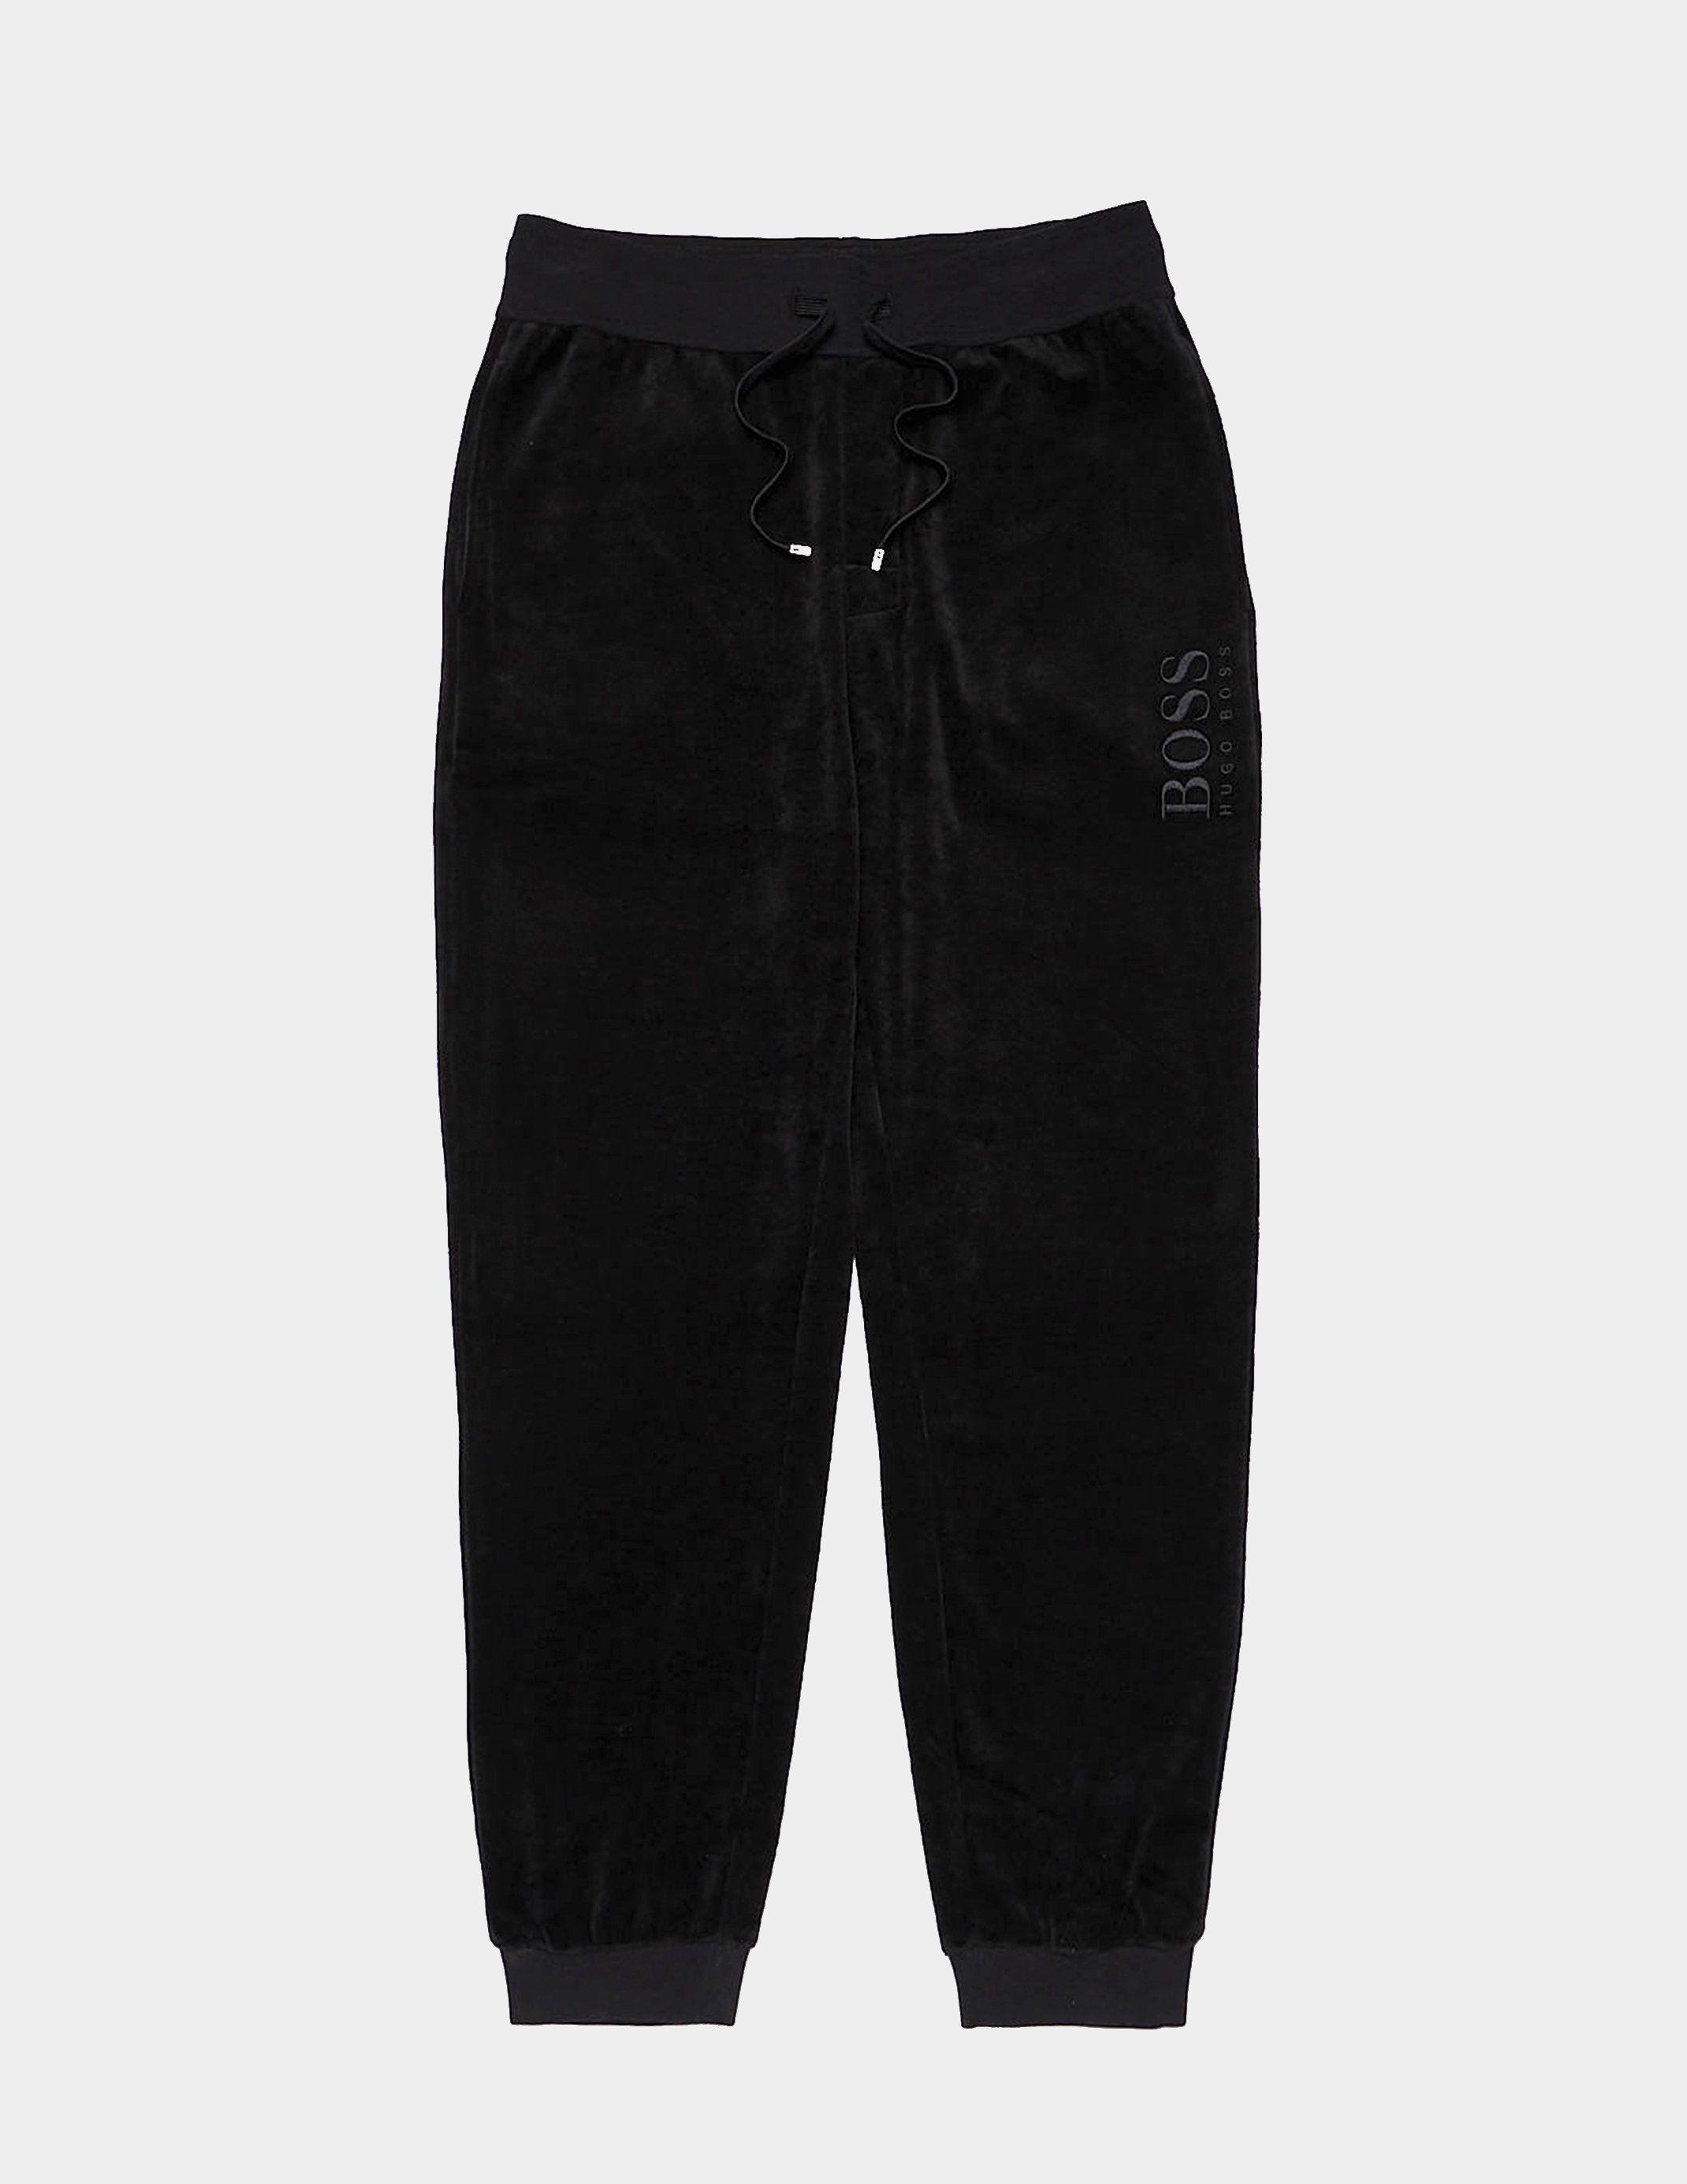 BOSS Velour Cuffed Track Pants